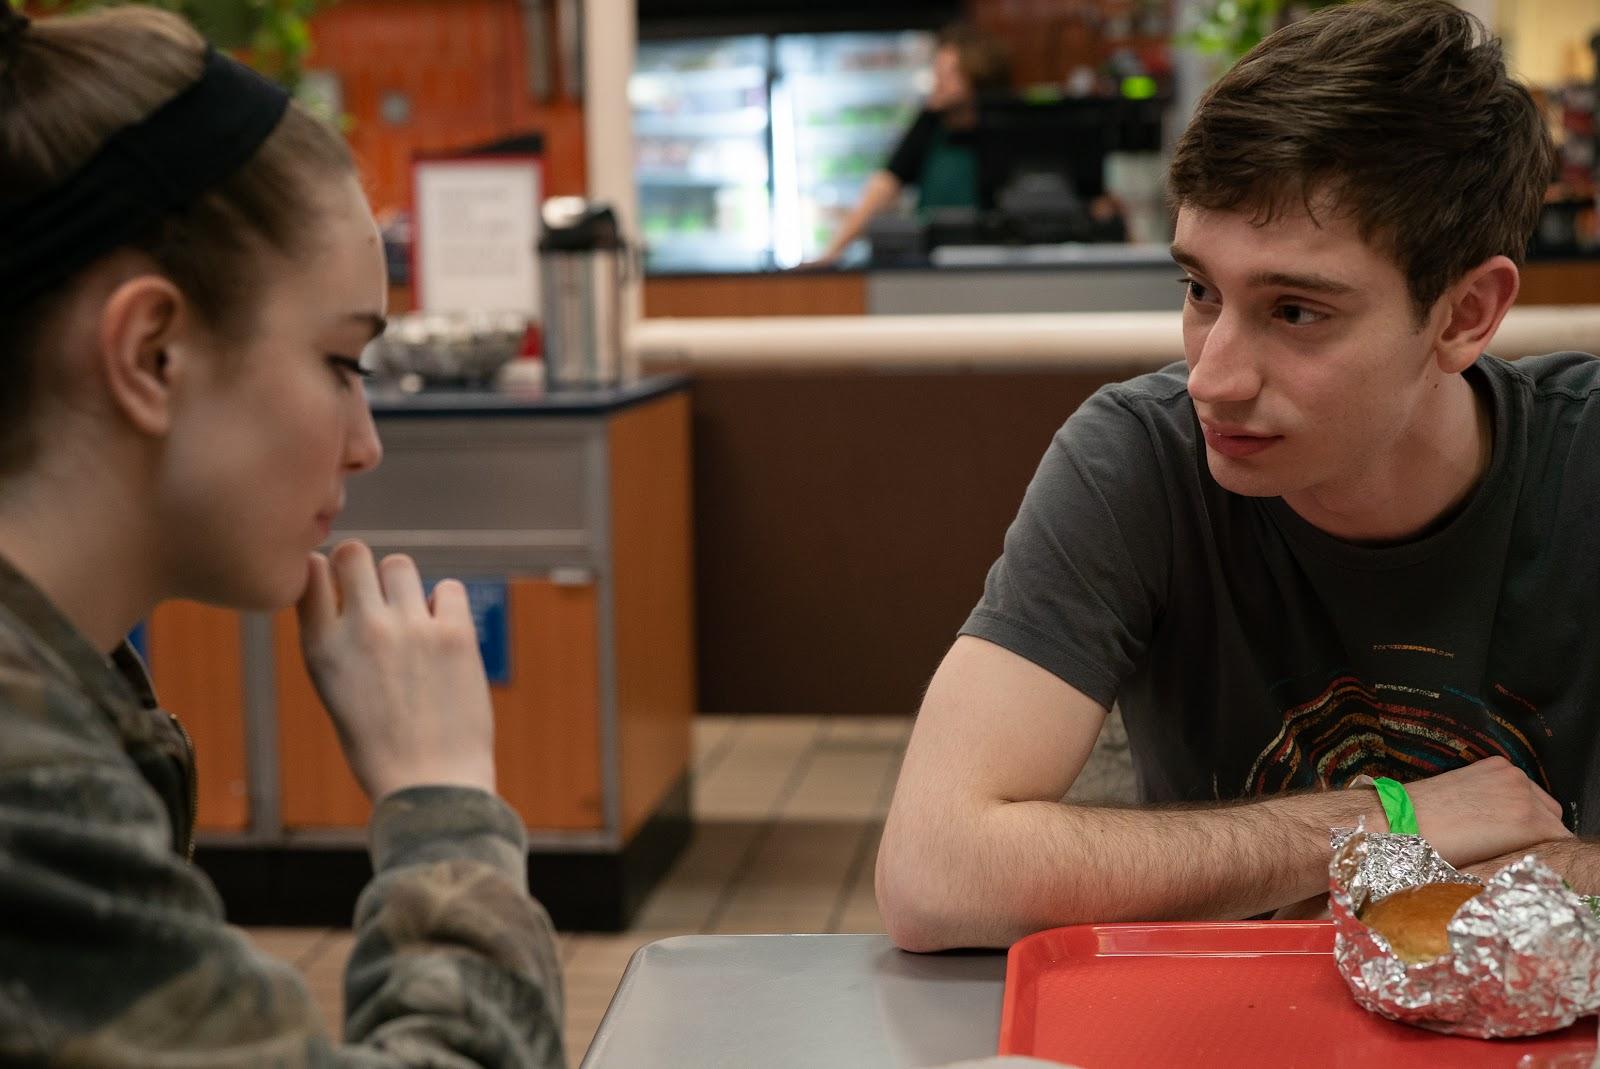 Jasper talks to Skylar across a table at a fast food restaurant.